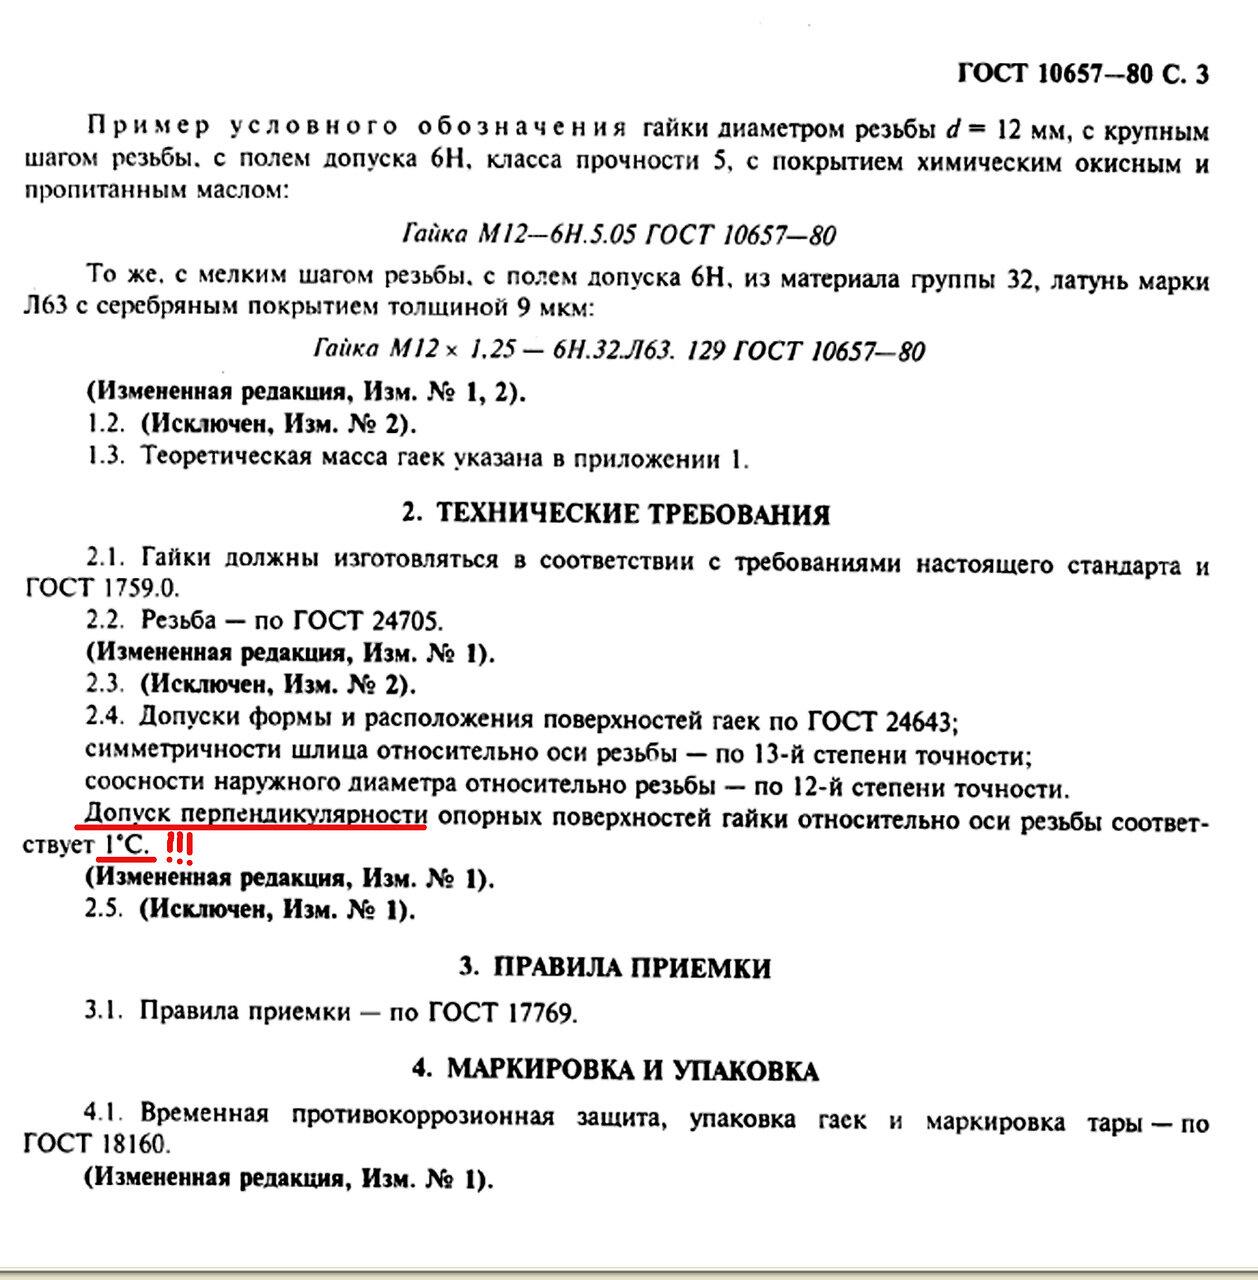 http://img-fotki.yandex.ru/get/6503/26873116.7/0_7f66f_64b13cf_XXXL.jpg